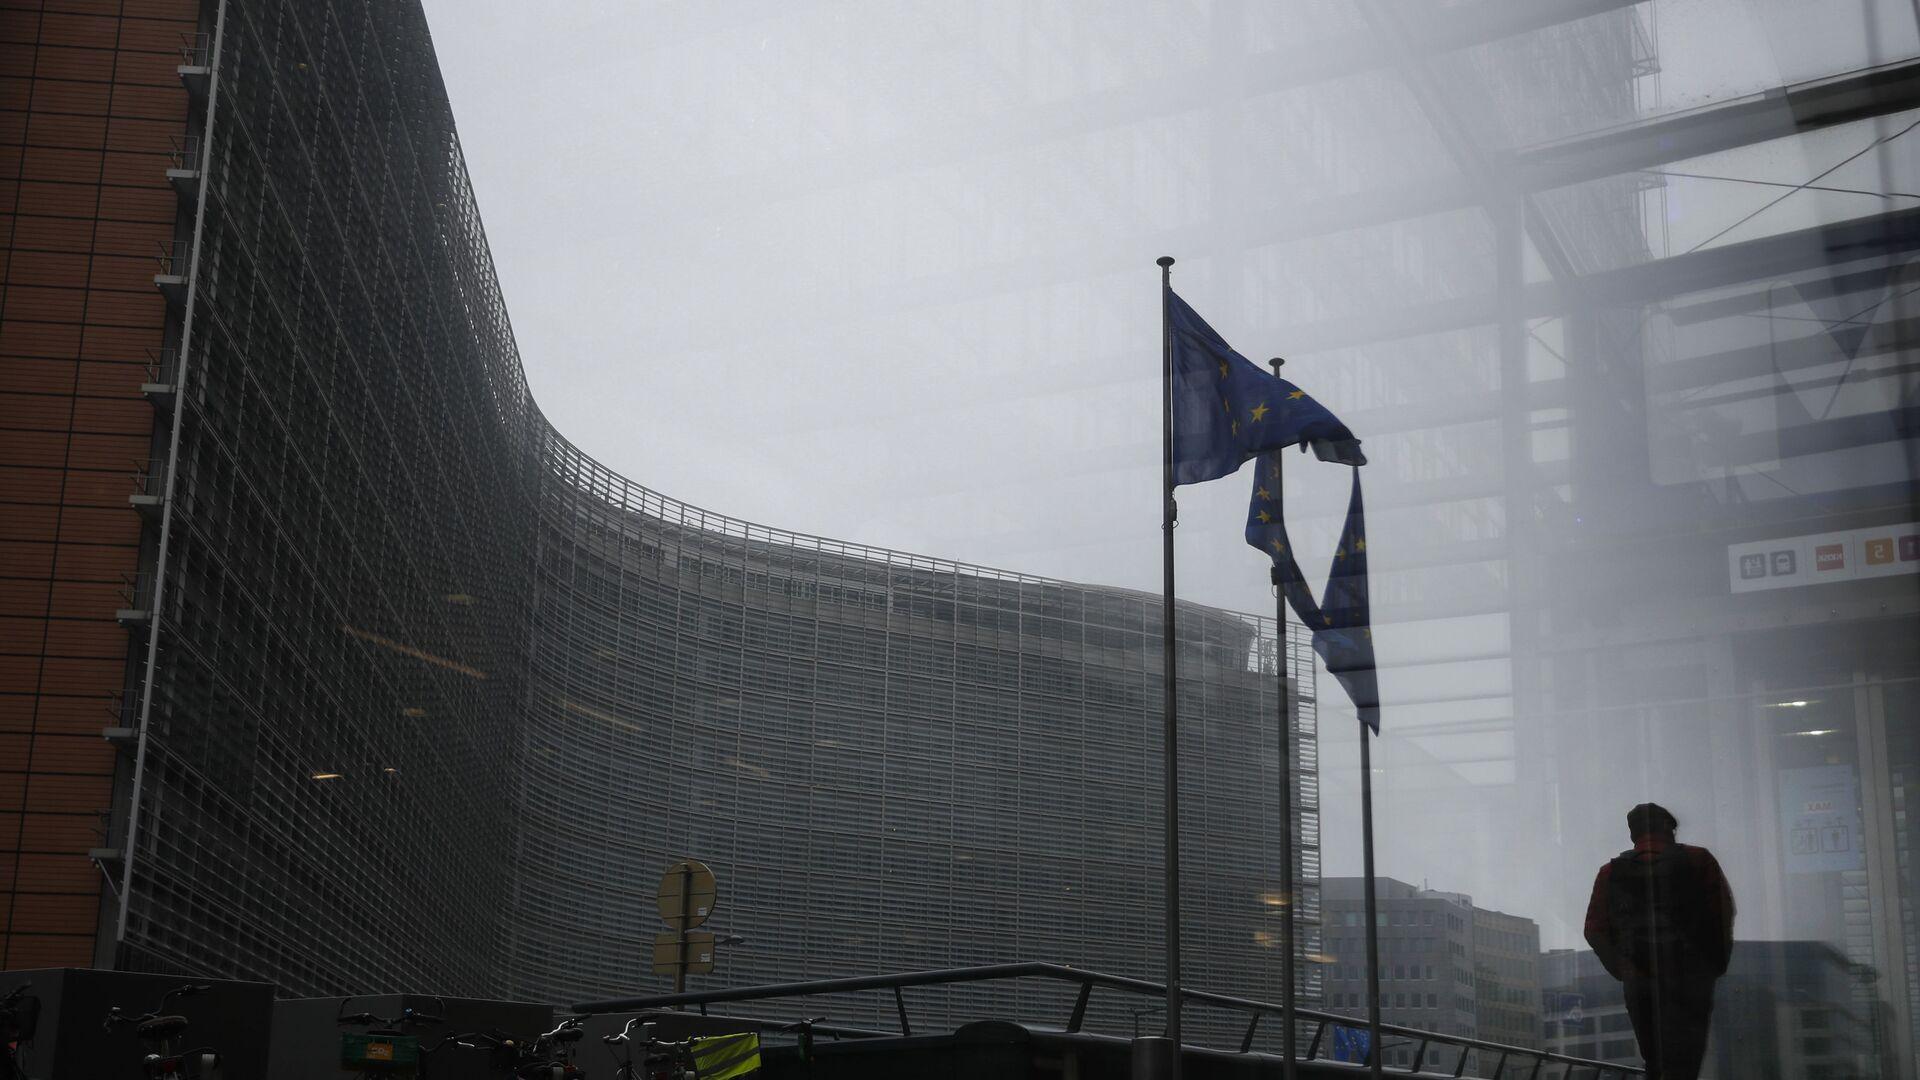 Komisja Europejska, Bruksela - Sputnik Polska, 1920, 03.09.2021